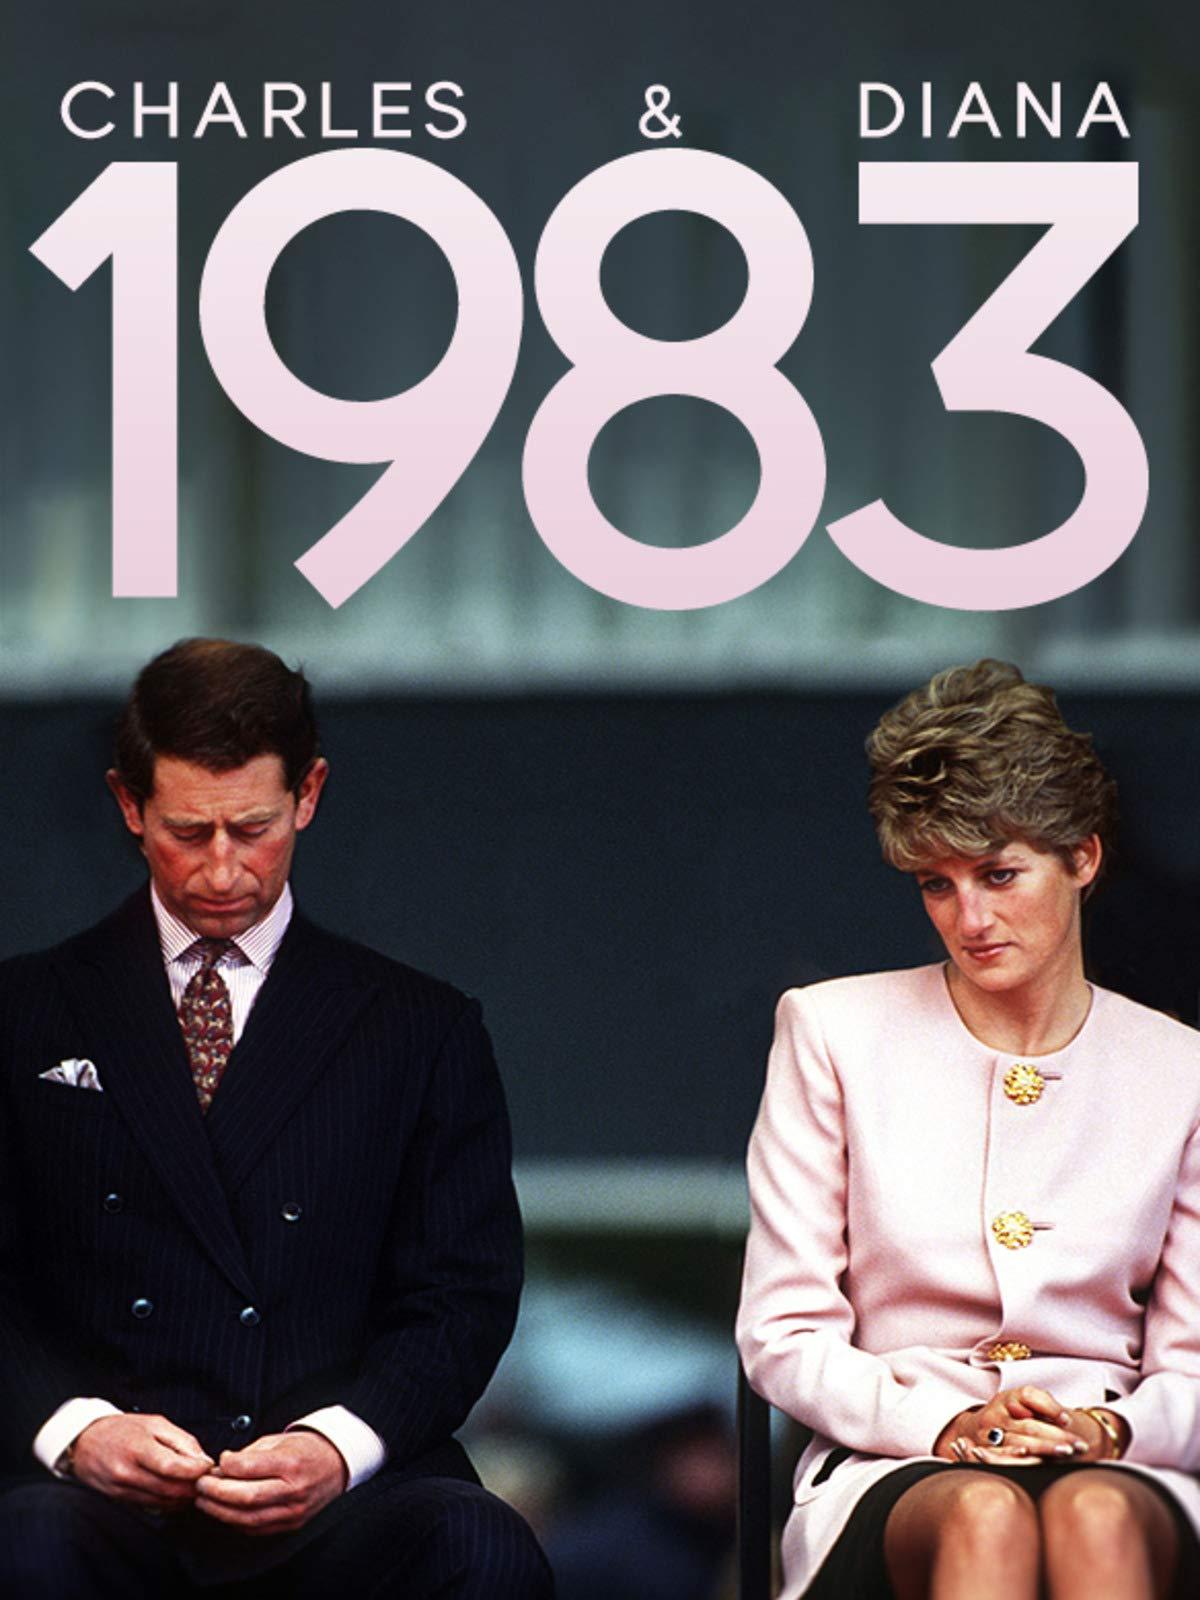 Charles & Diana: 1983